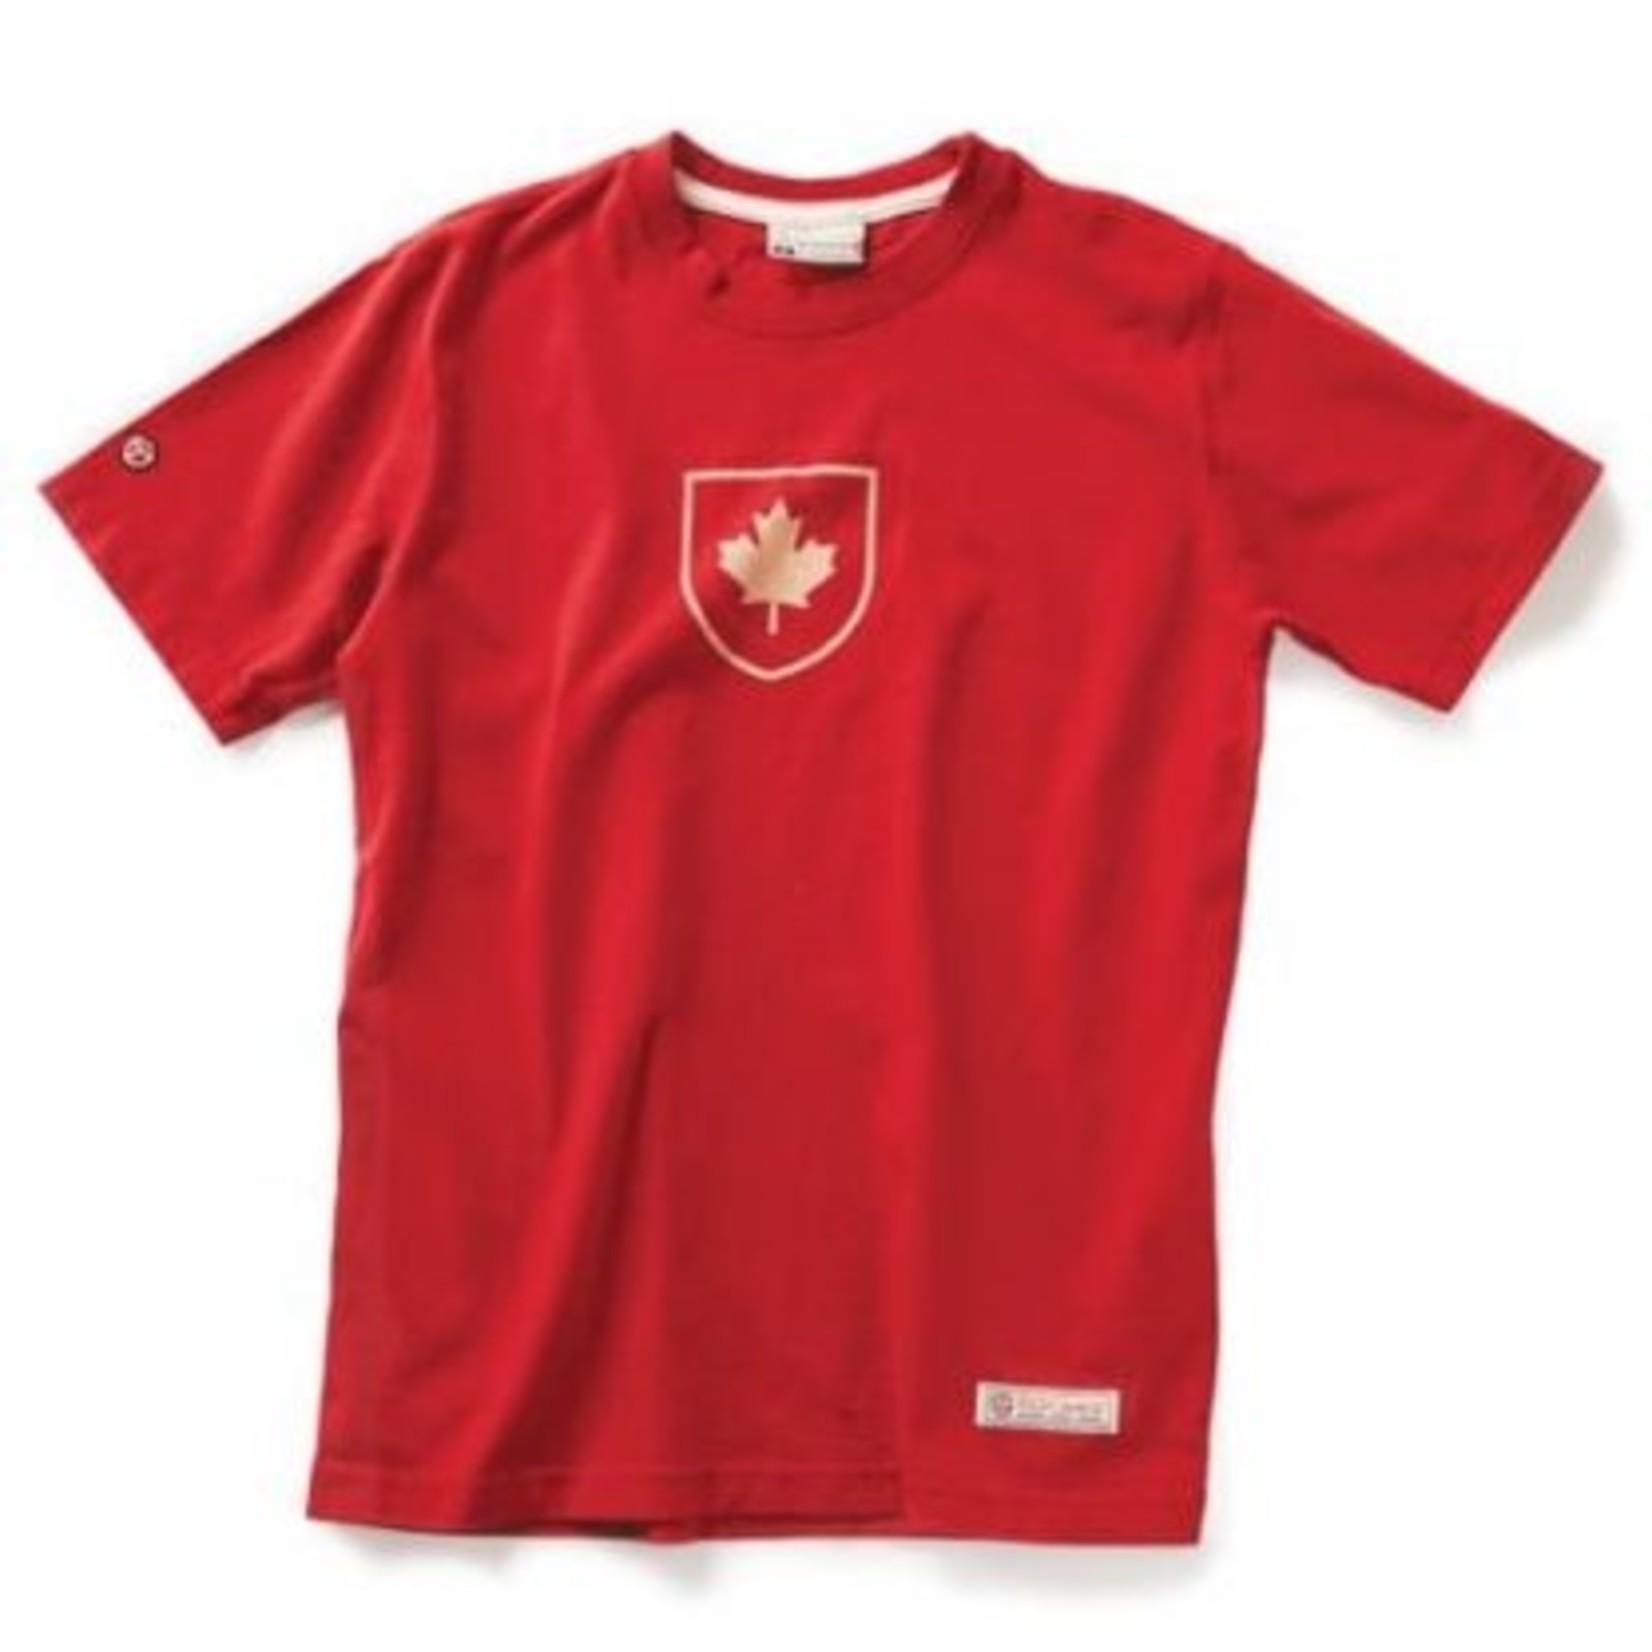 Red Canoe Red Canoe Canada Shield T-Shirt